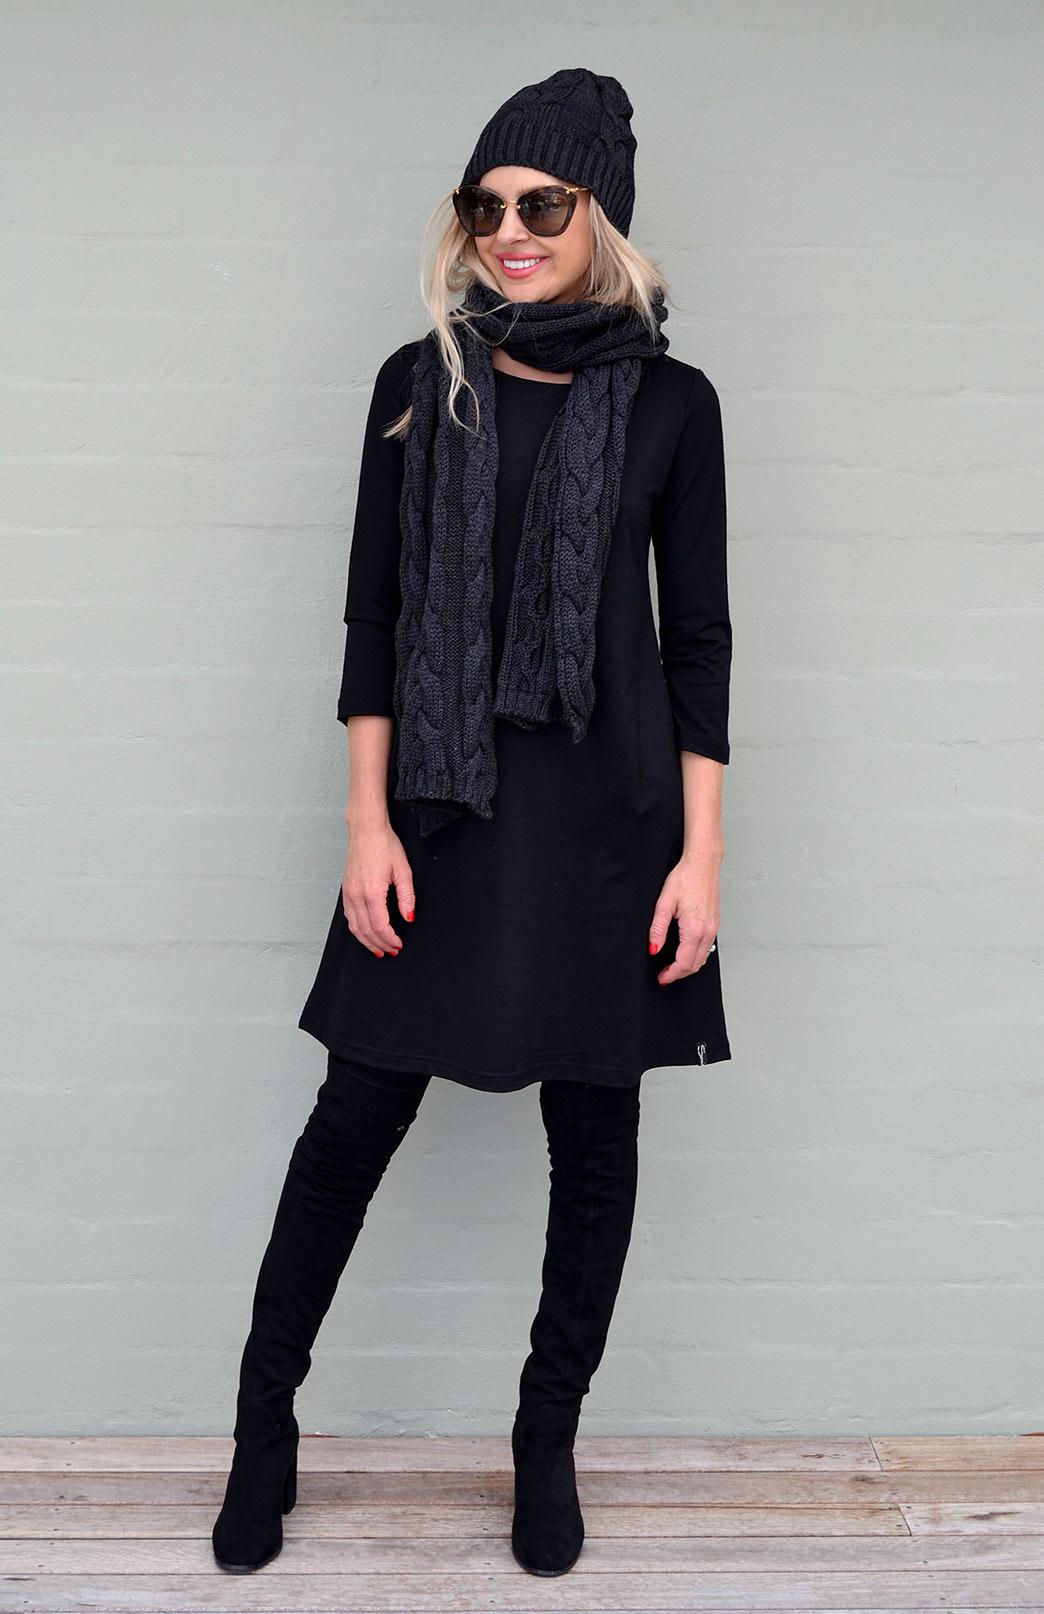 Ellie Dress - Women's Black Merino Wool Classic Ellie Dress - Smitten Merino Tasmania Australia